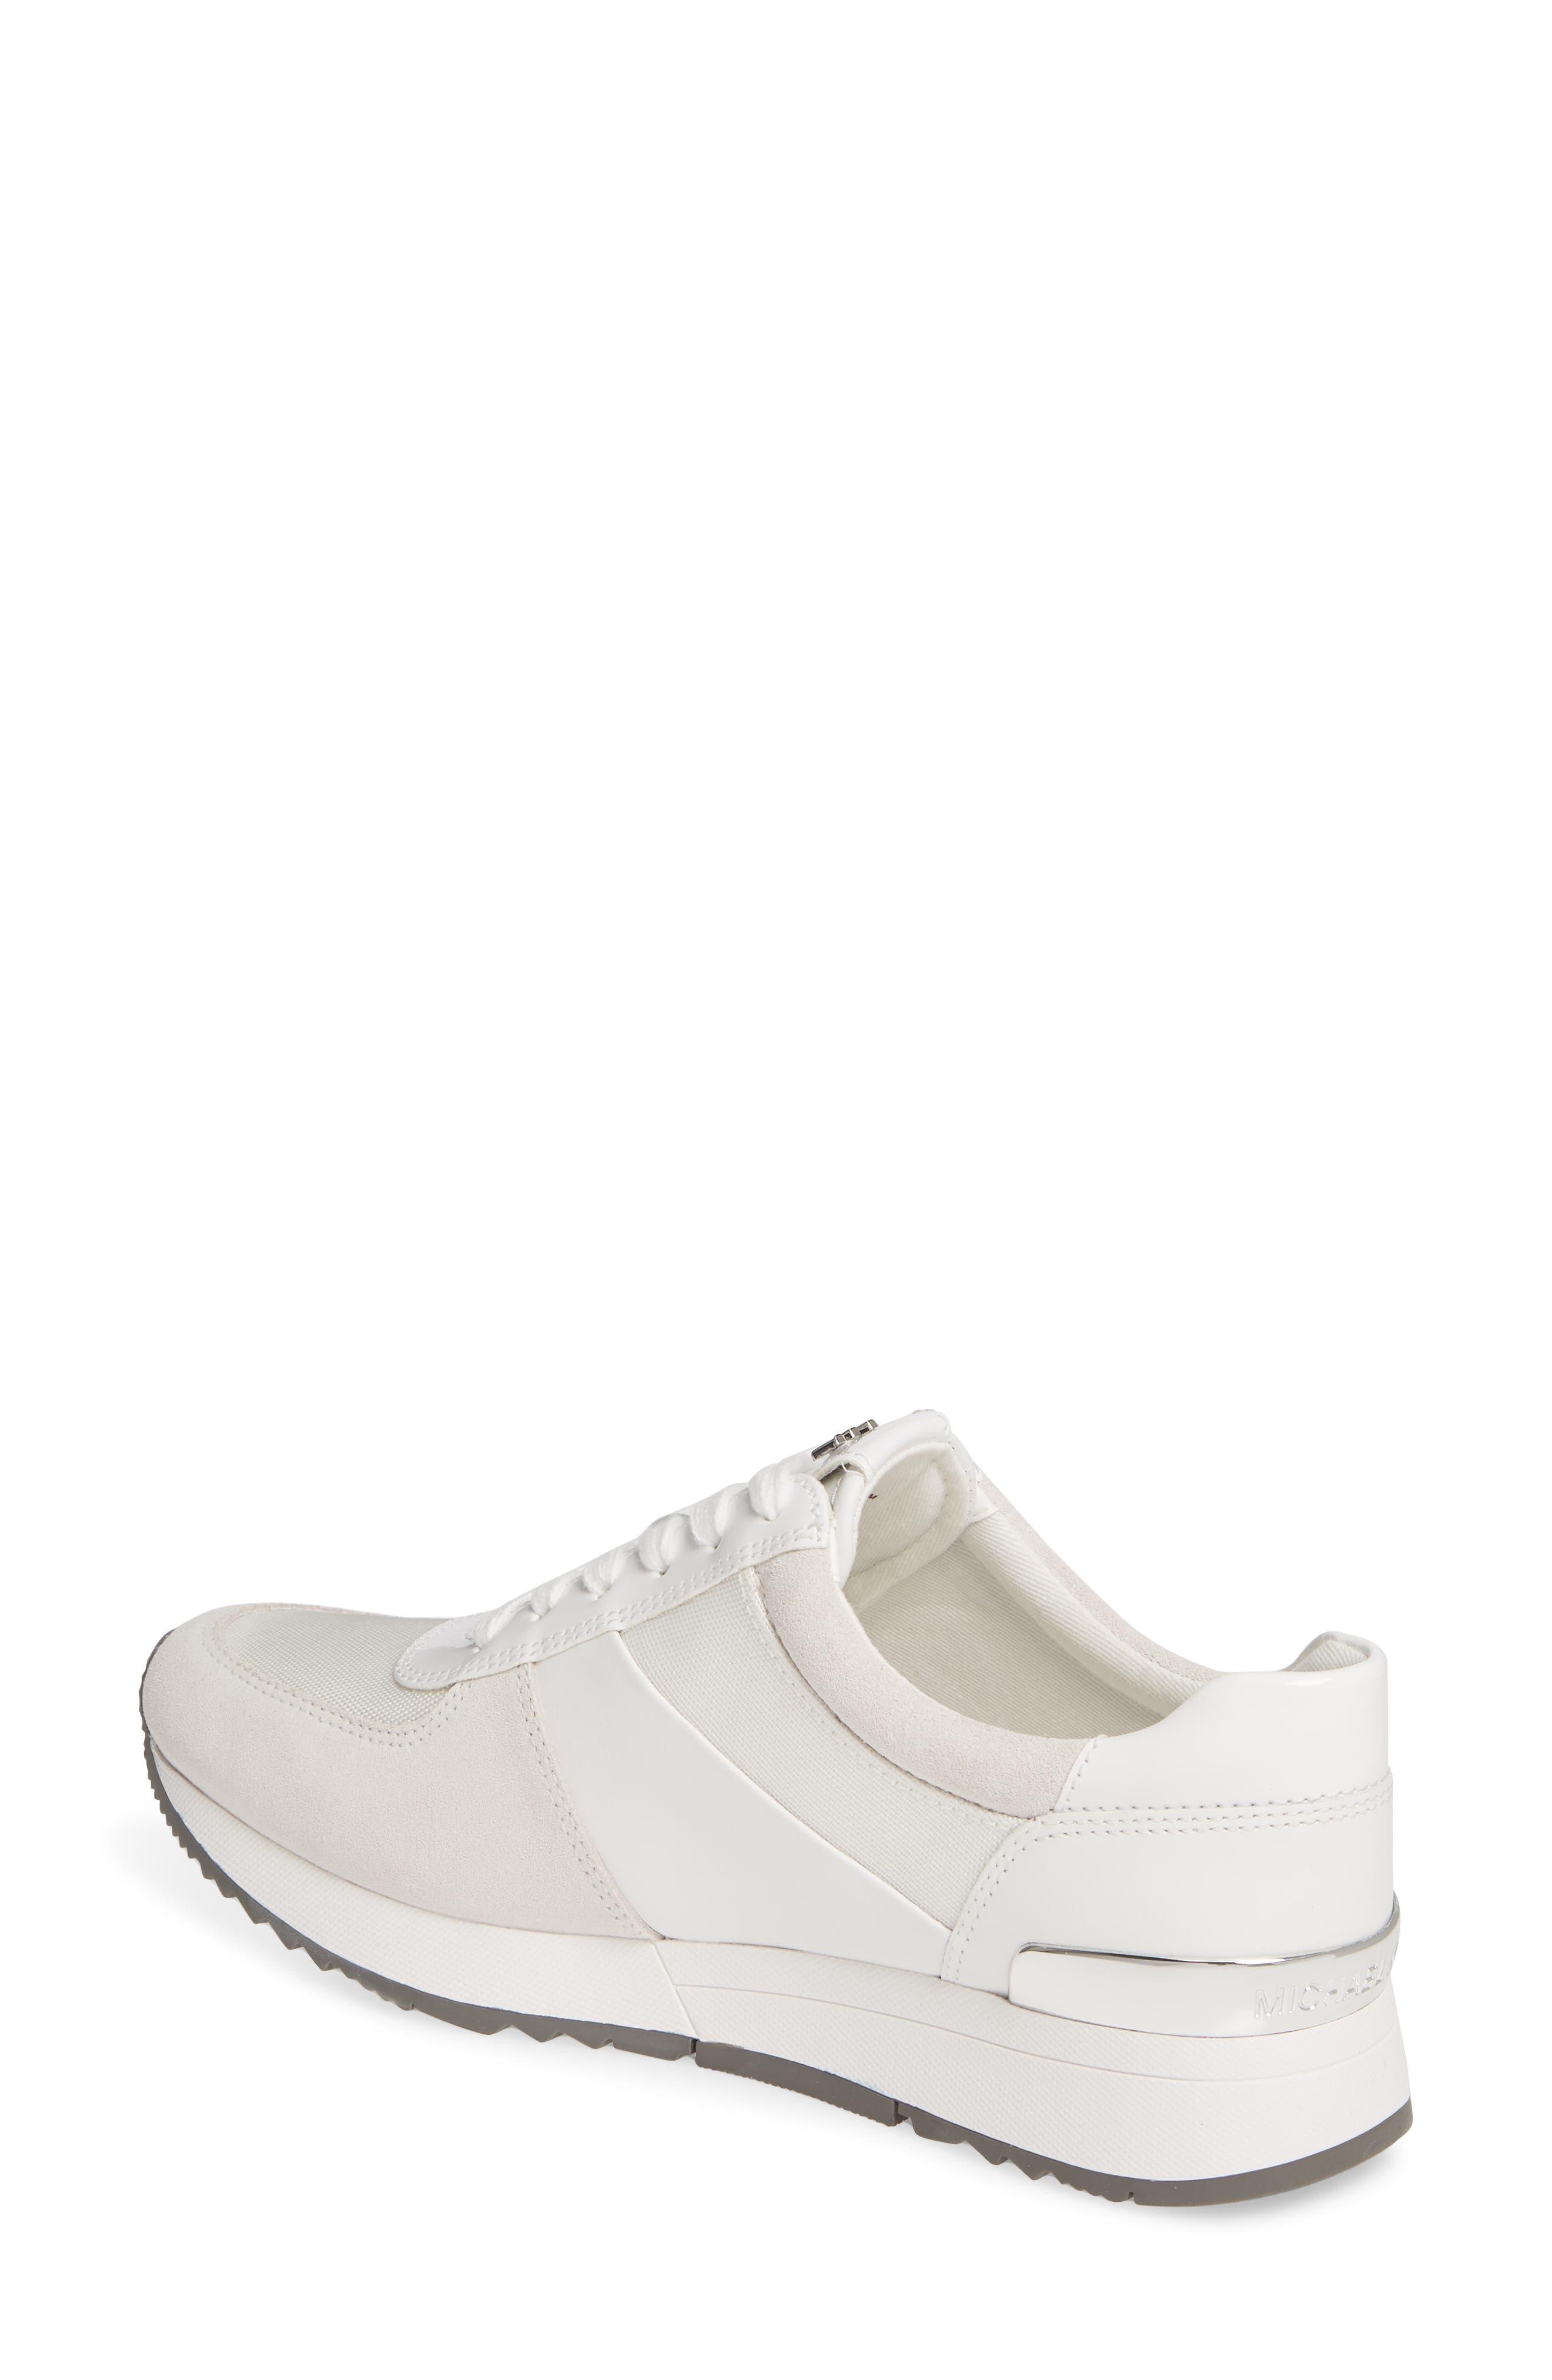 MICHAEL MICHAEL KORS, 'Allie' Sneaker, Alternate thumbnail 2, color, OPTIC WHITE LEATHER/ CANVAS